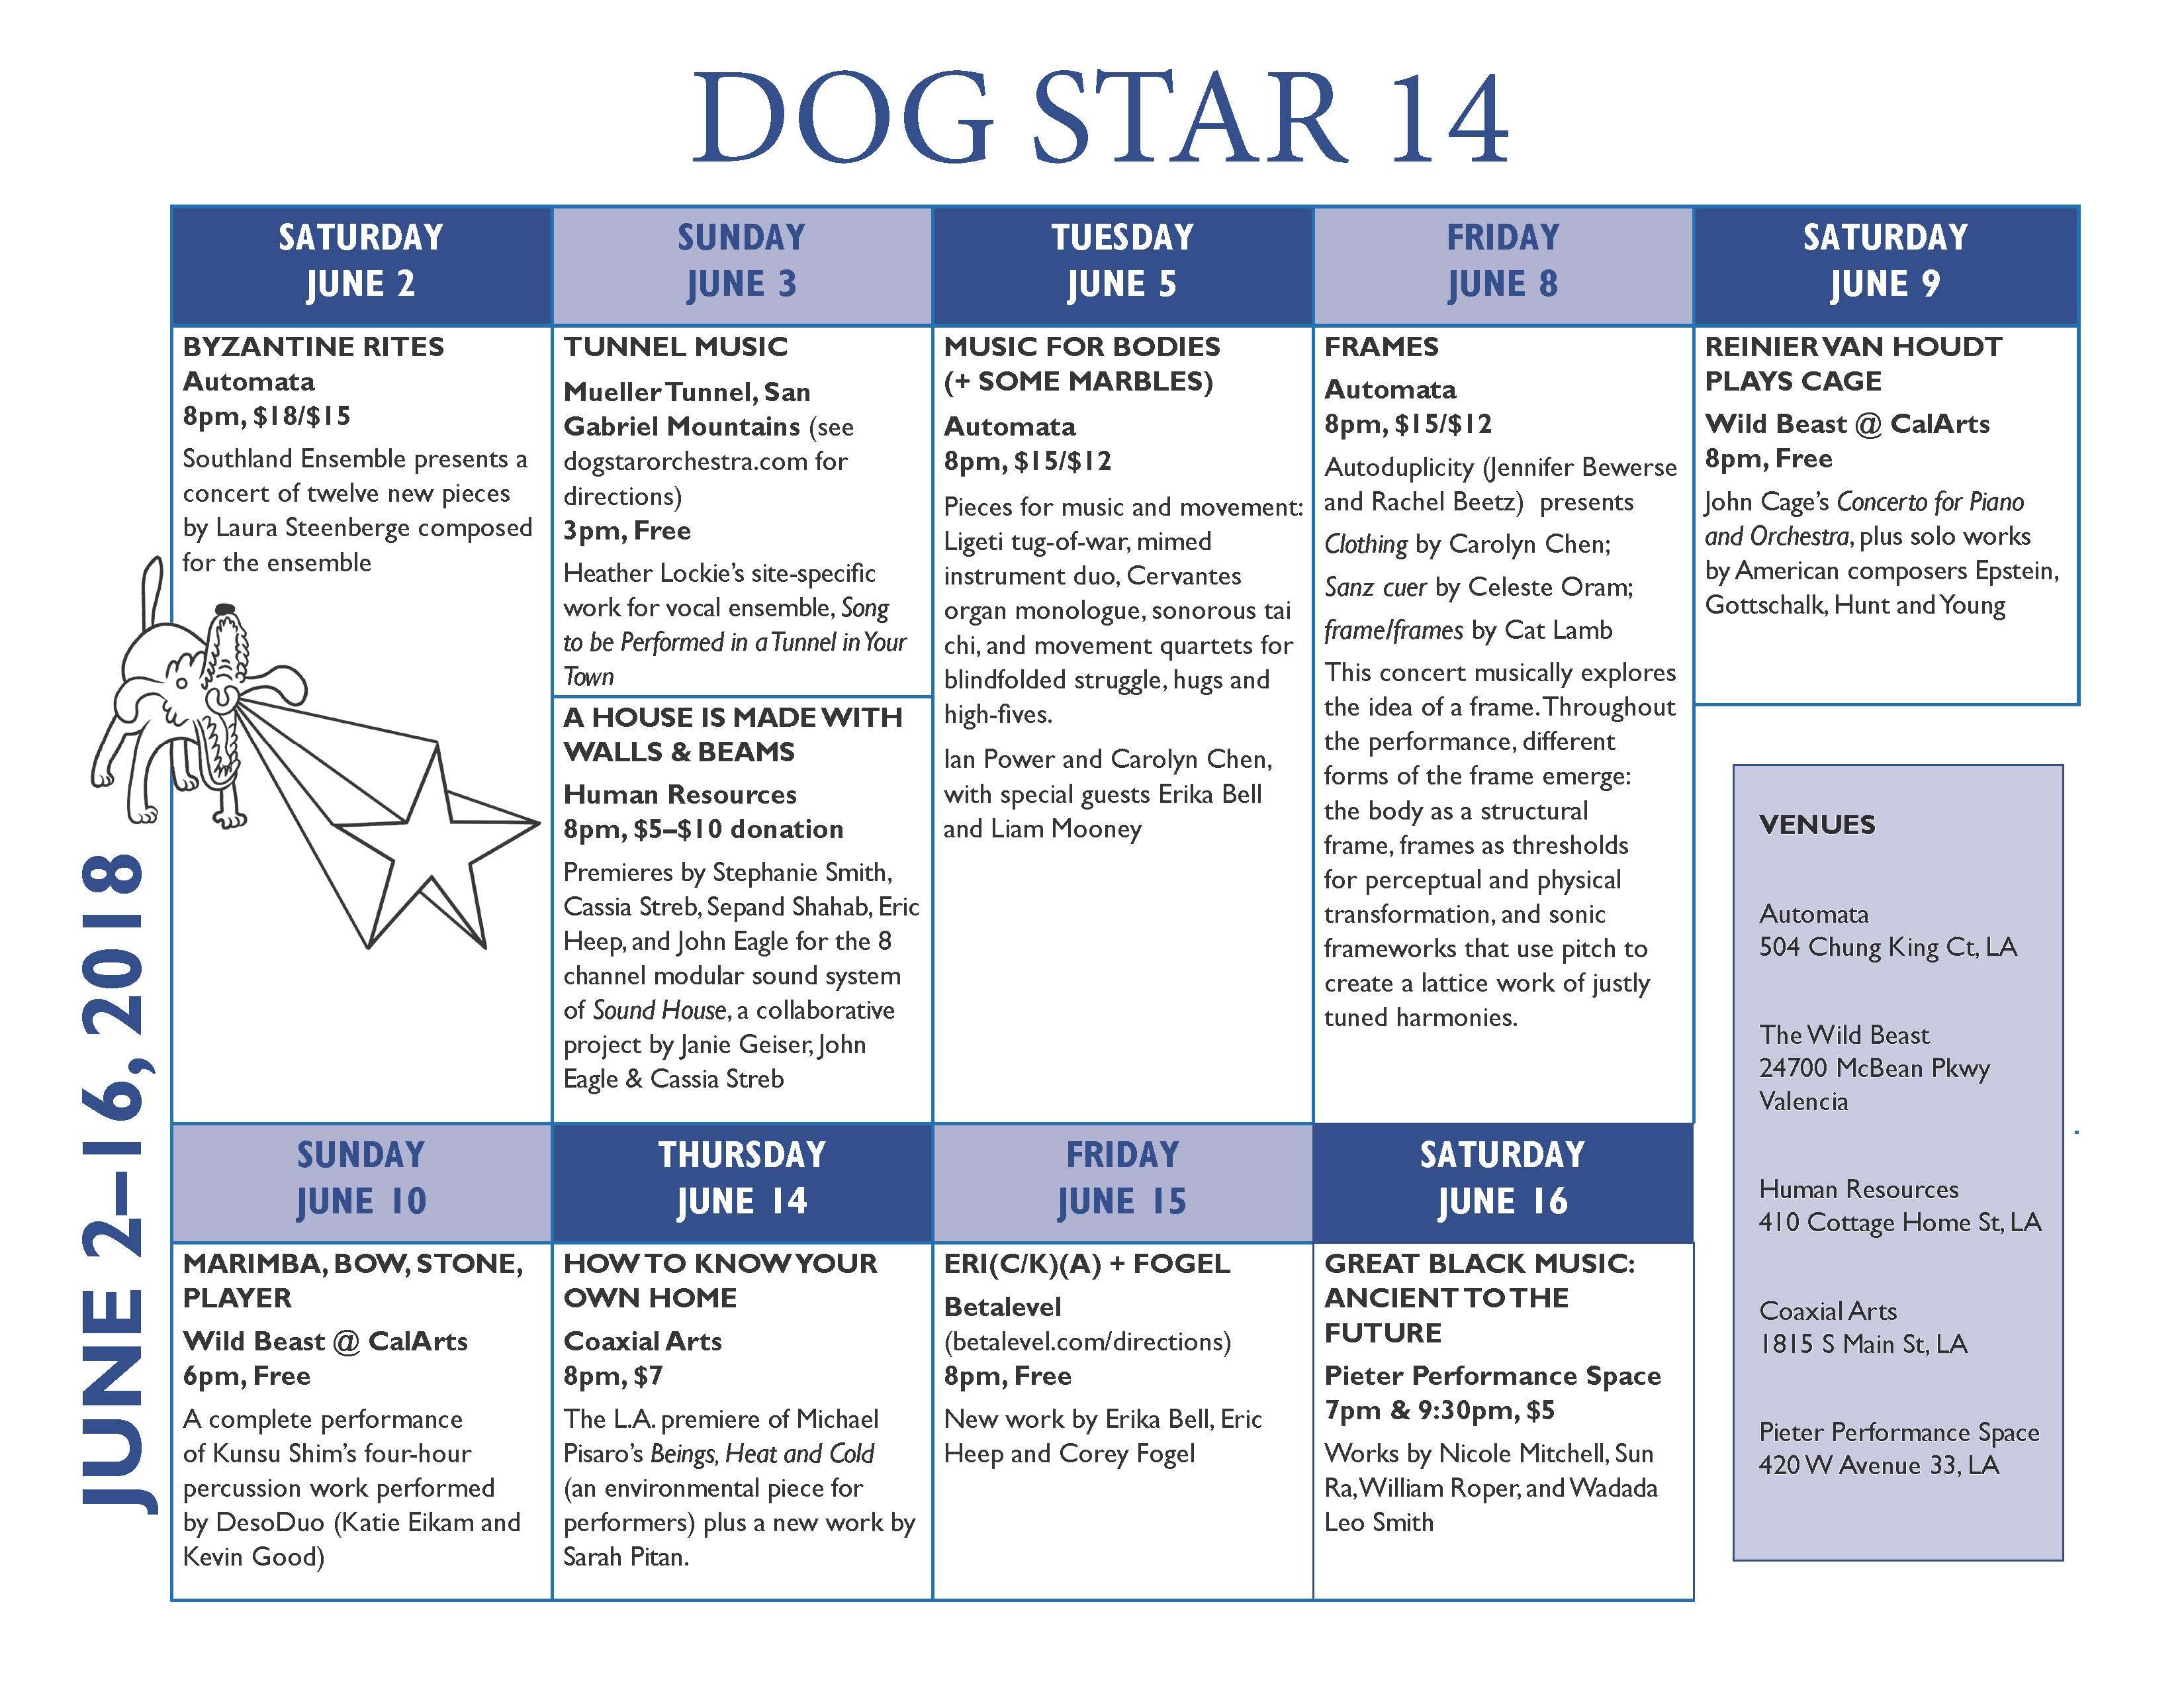 dogstar 14 may 31